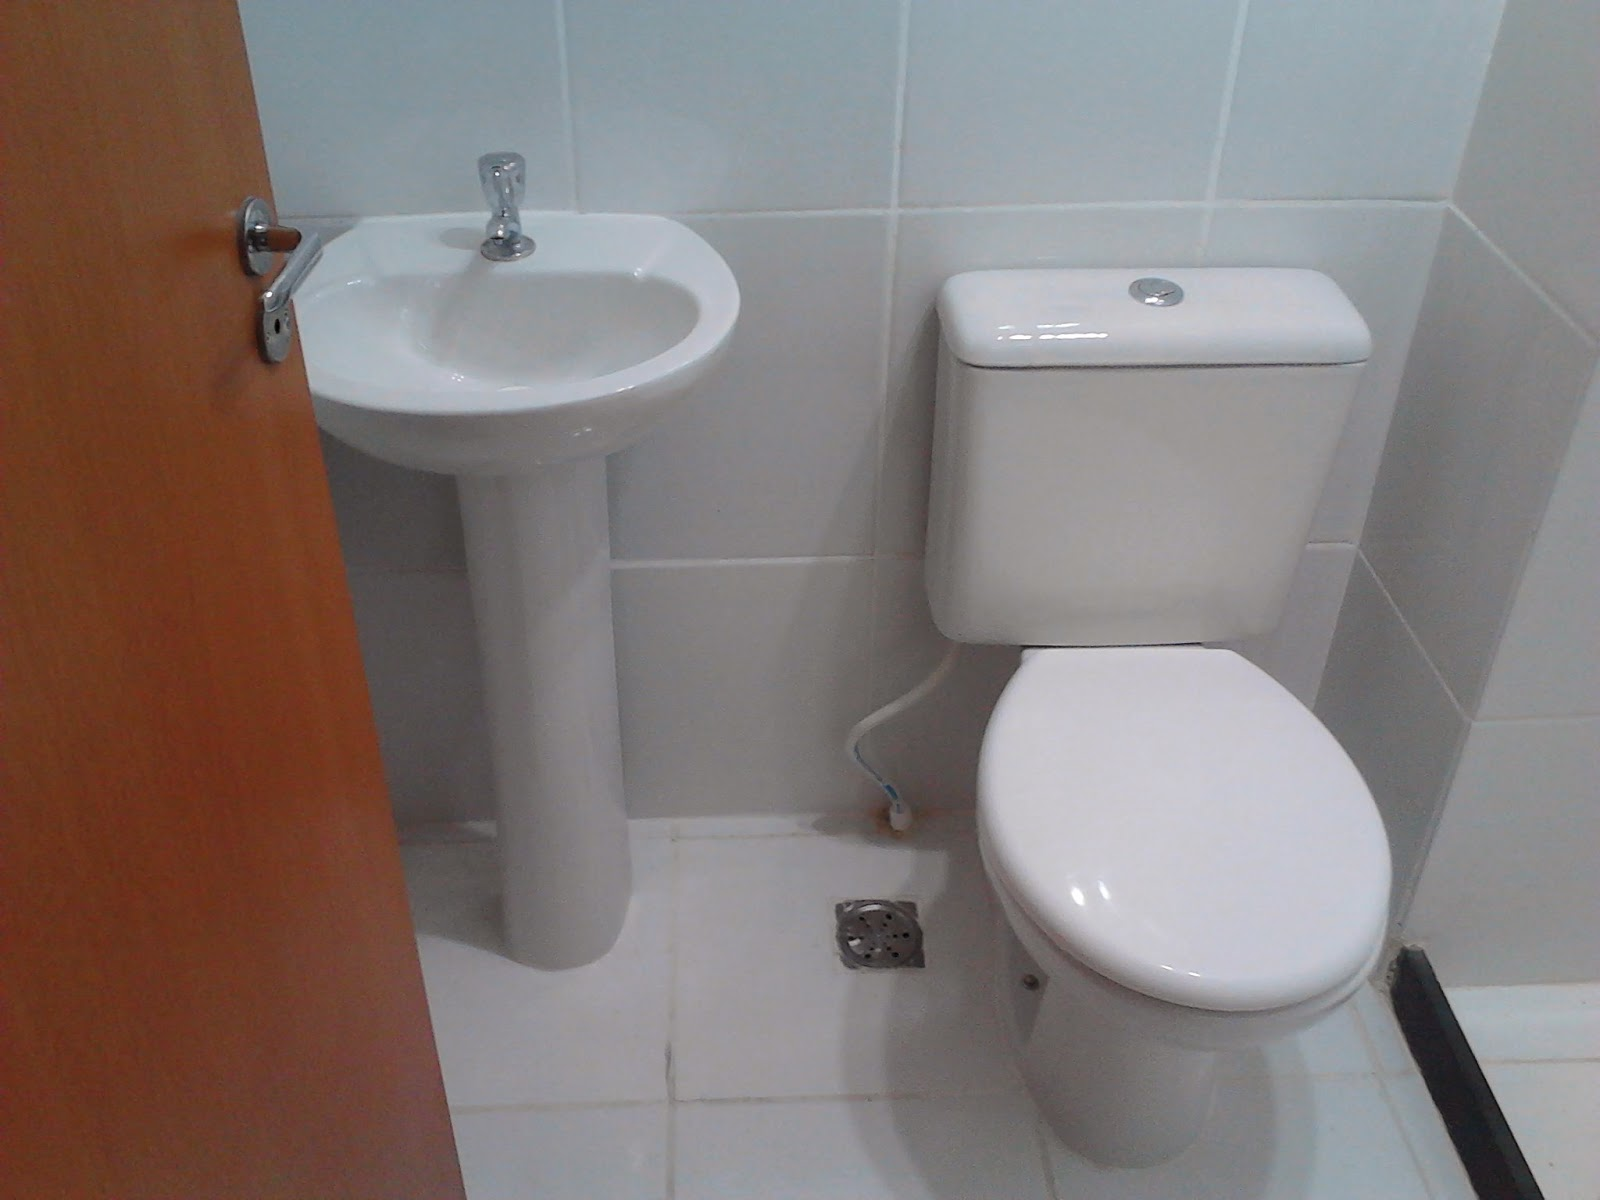 Cafofo Sonhado Decorando banheiros pequenos 2 banheiros, 2m² cada, 2 decora -> Banheiro Pequeno Diferente